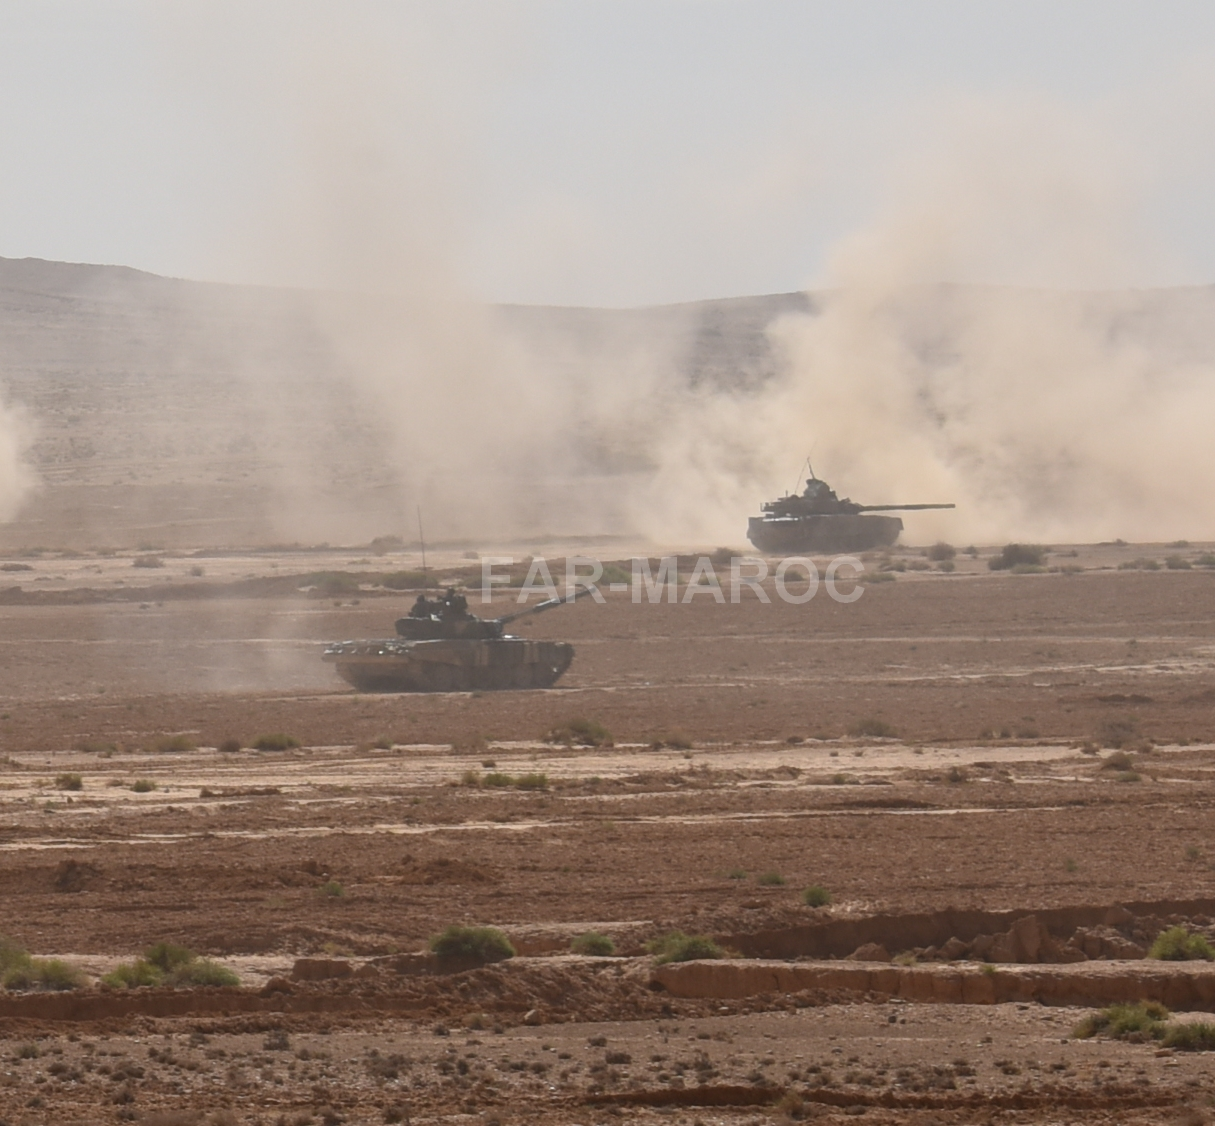 Chars VT-1A Marocains / Moroccan VT-1A MBT - Page 32 49275144153_46ae46630f_o